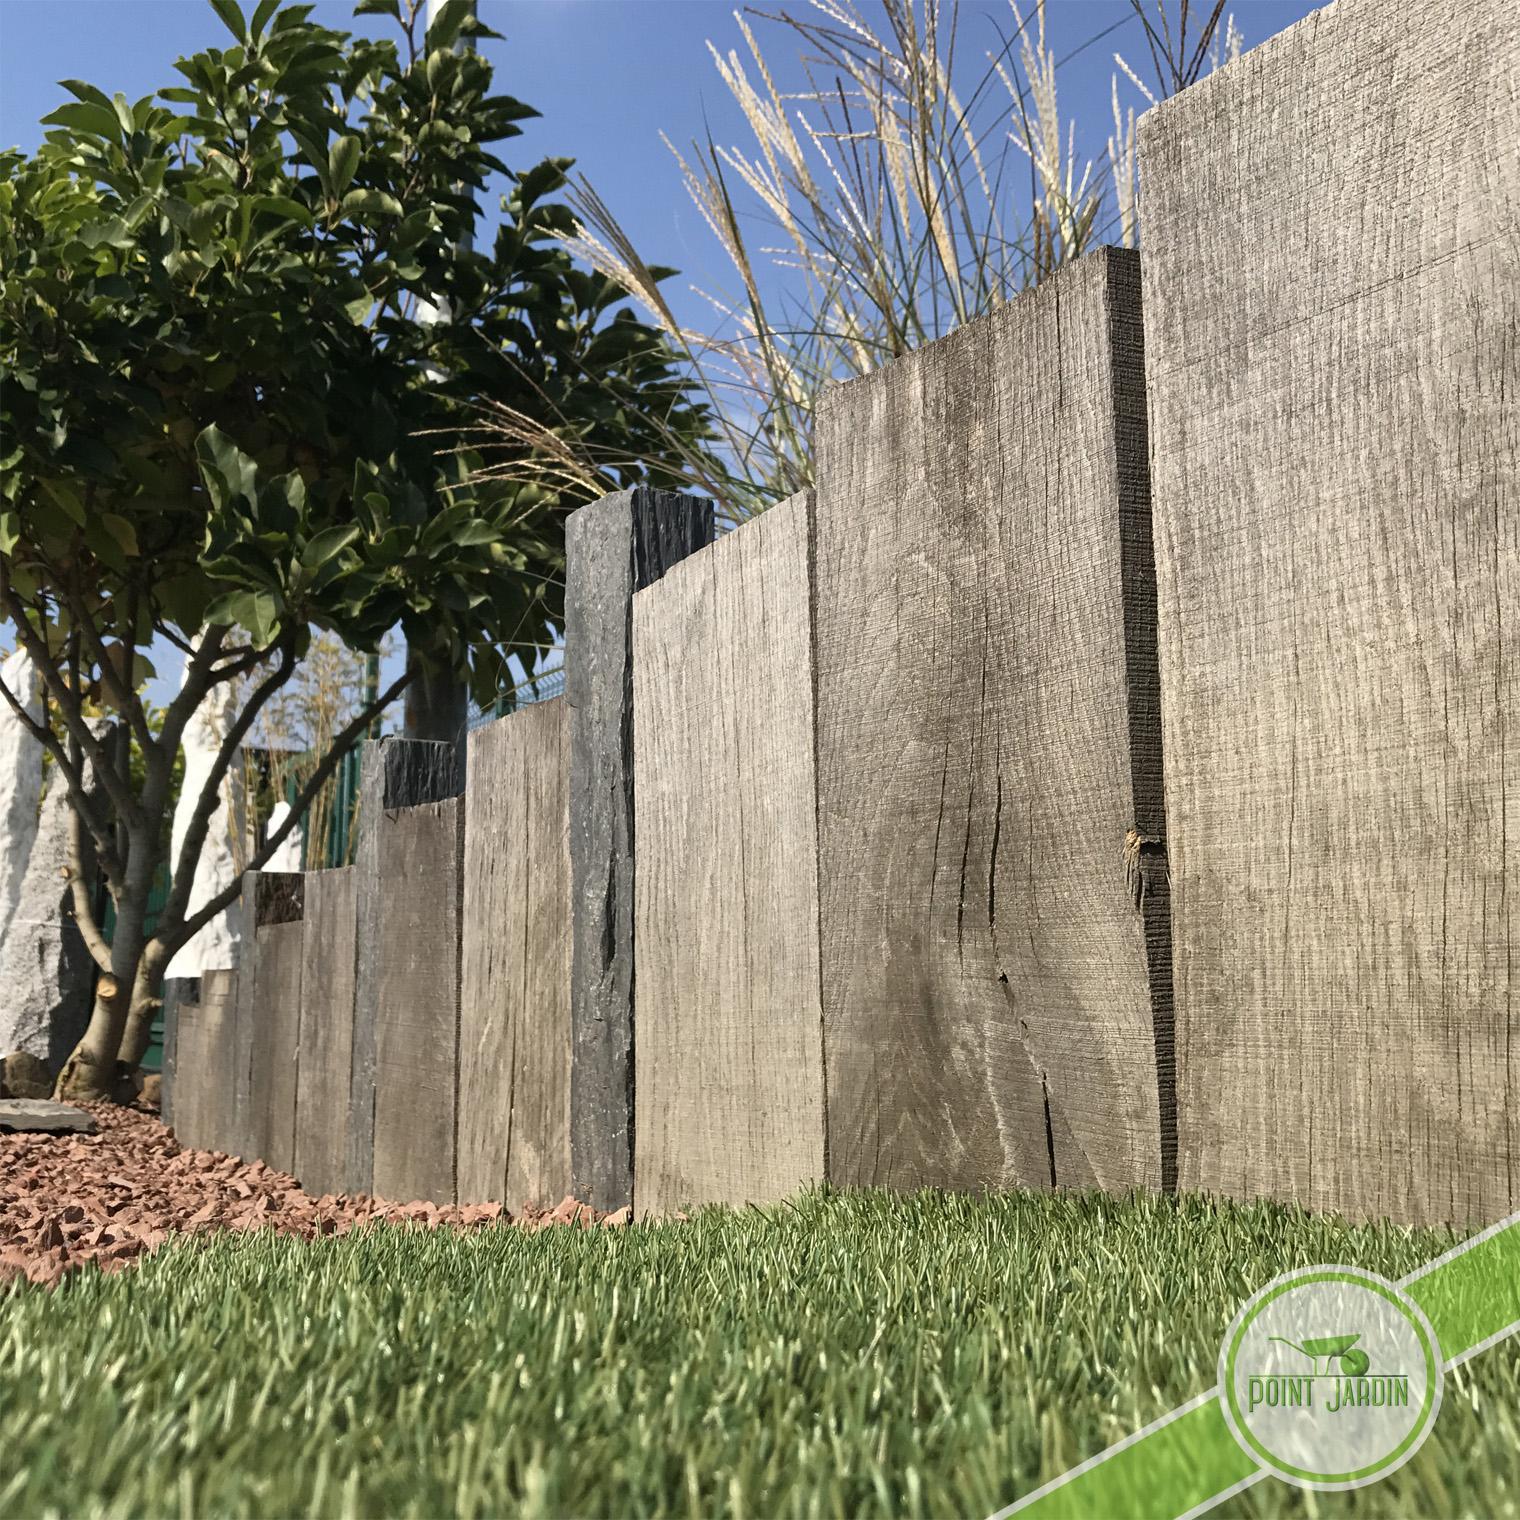 Traverse Chêne concernant Traverse Bois Pour Jardin